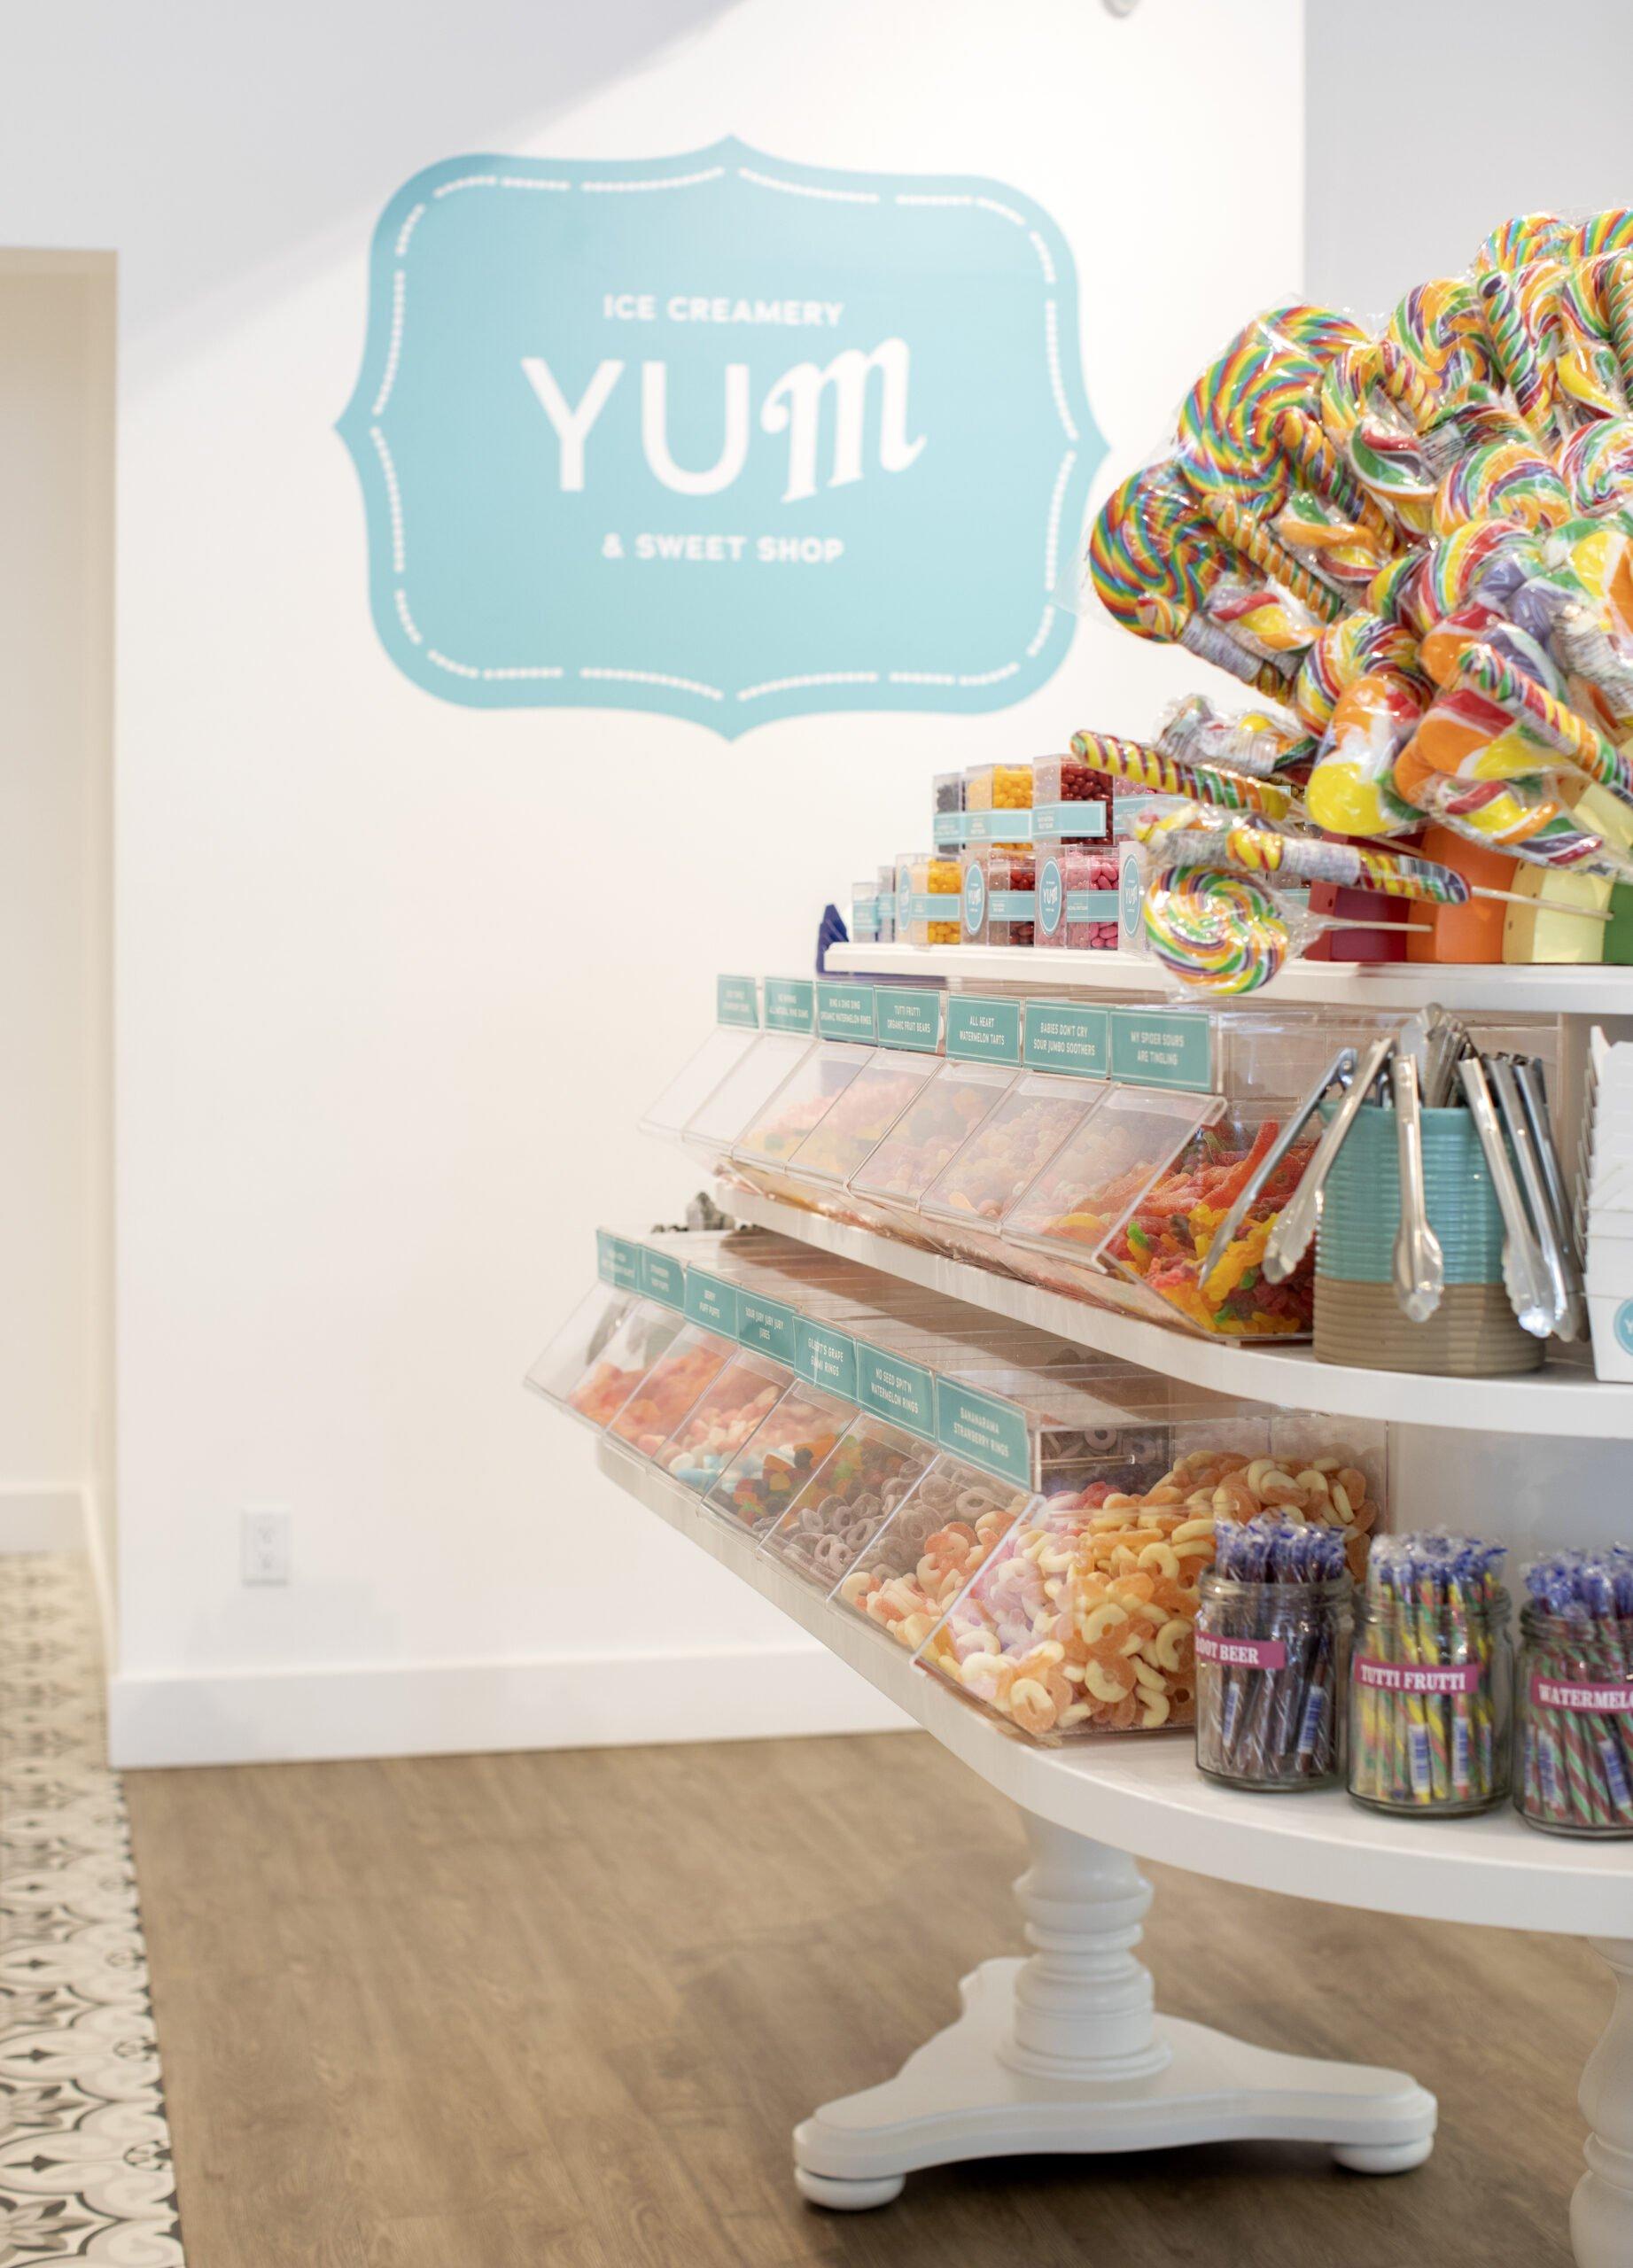 Interior of YUM Ice Creamery and Sweet Shop.